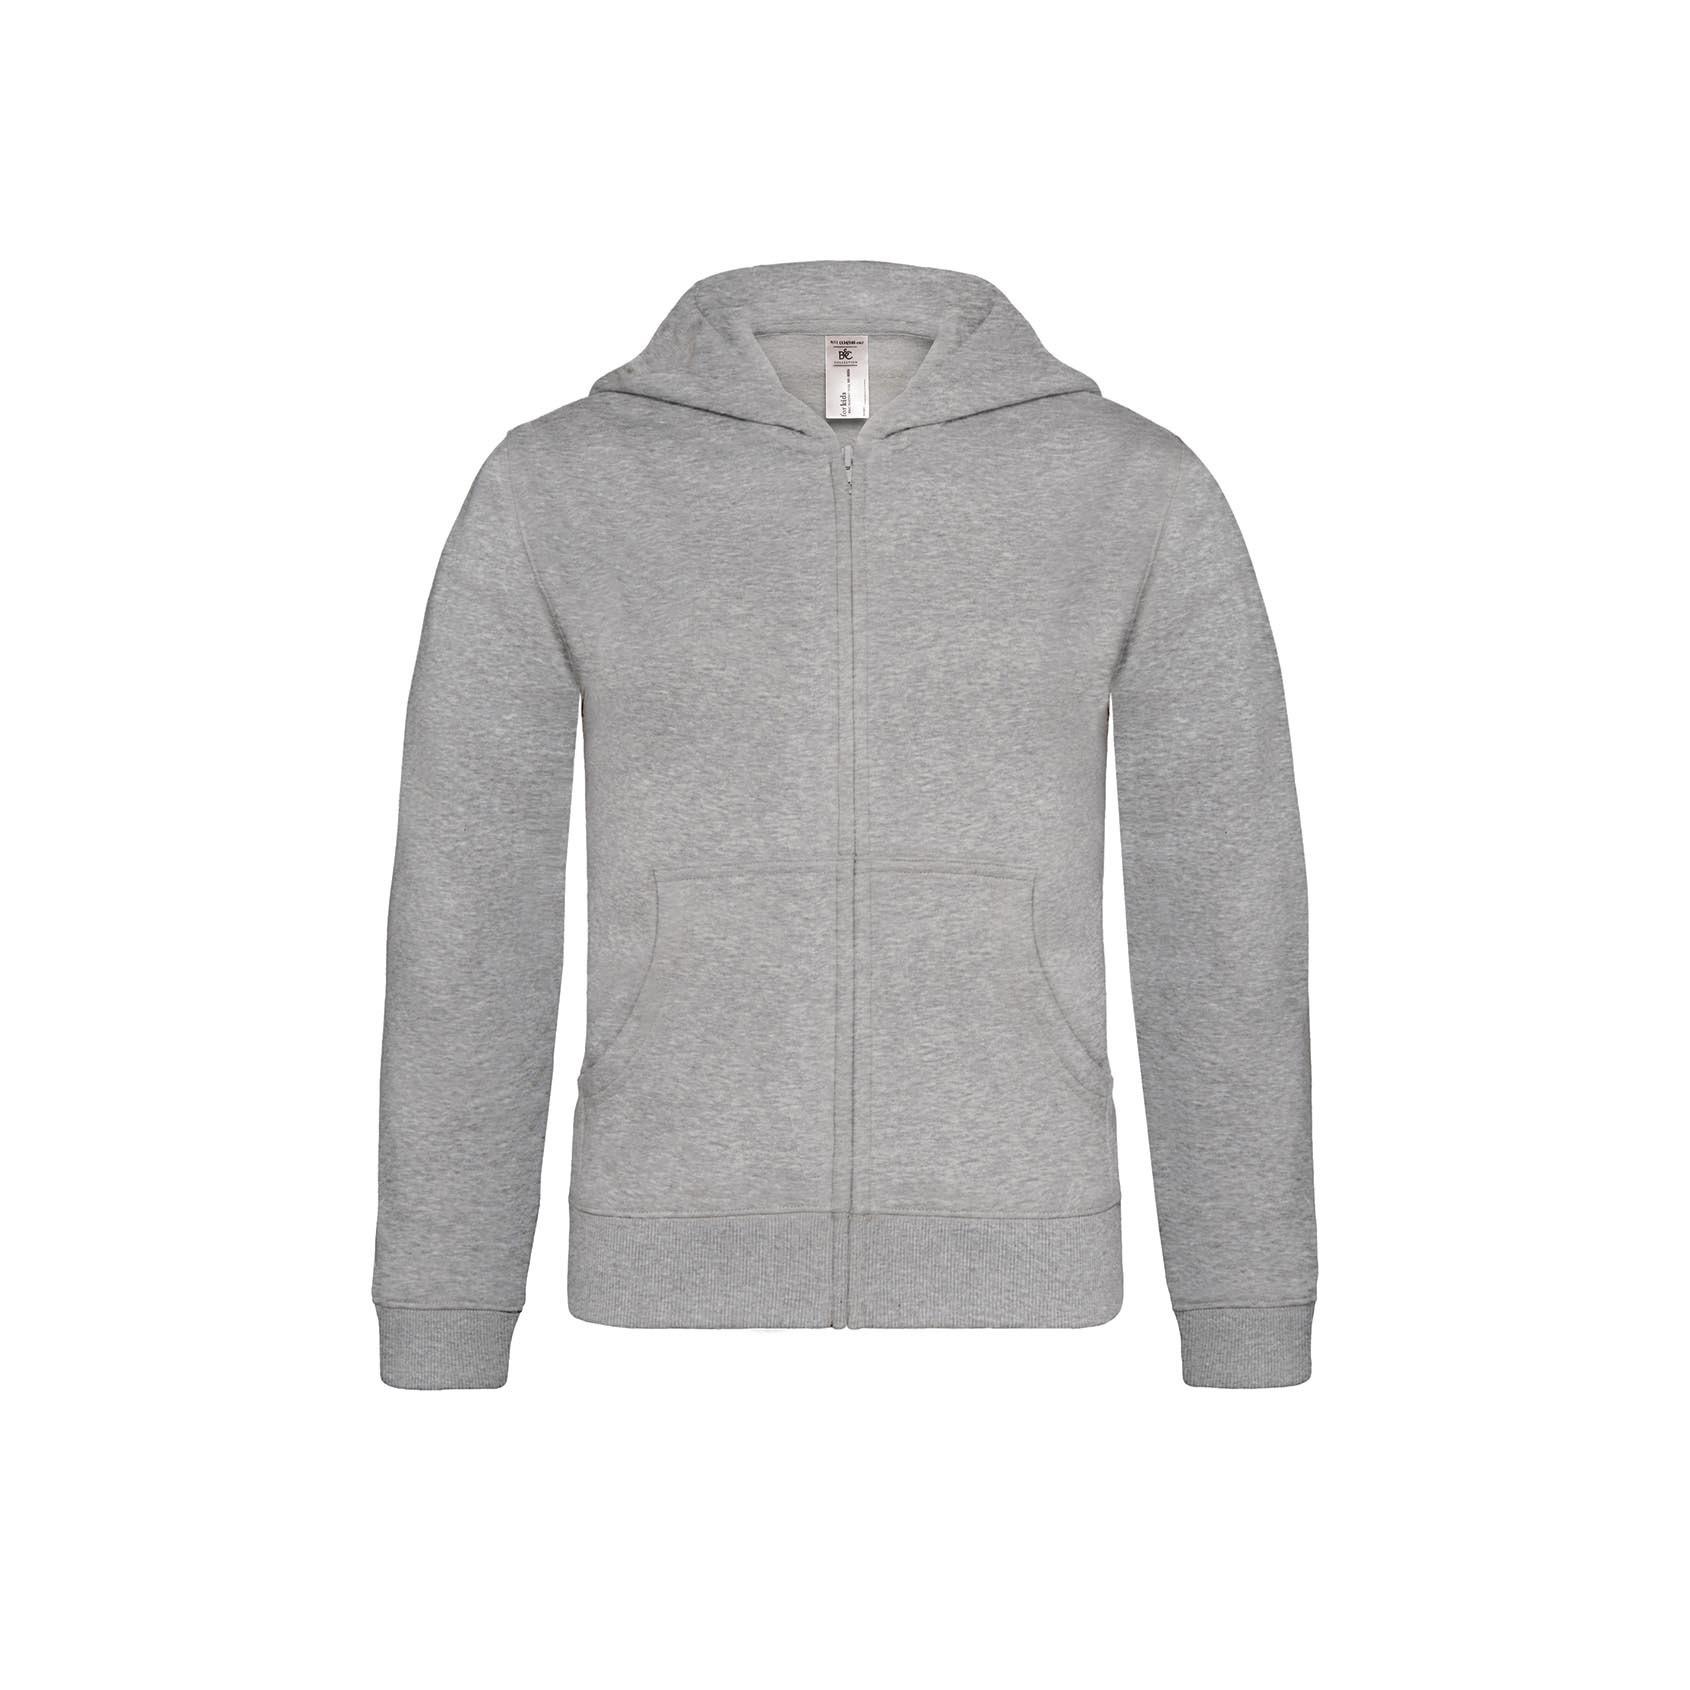 99d44443b B&C Hooded Full Zip /kids | B&C Collection